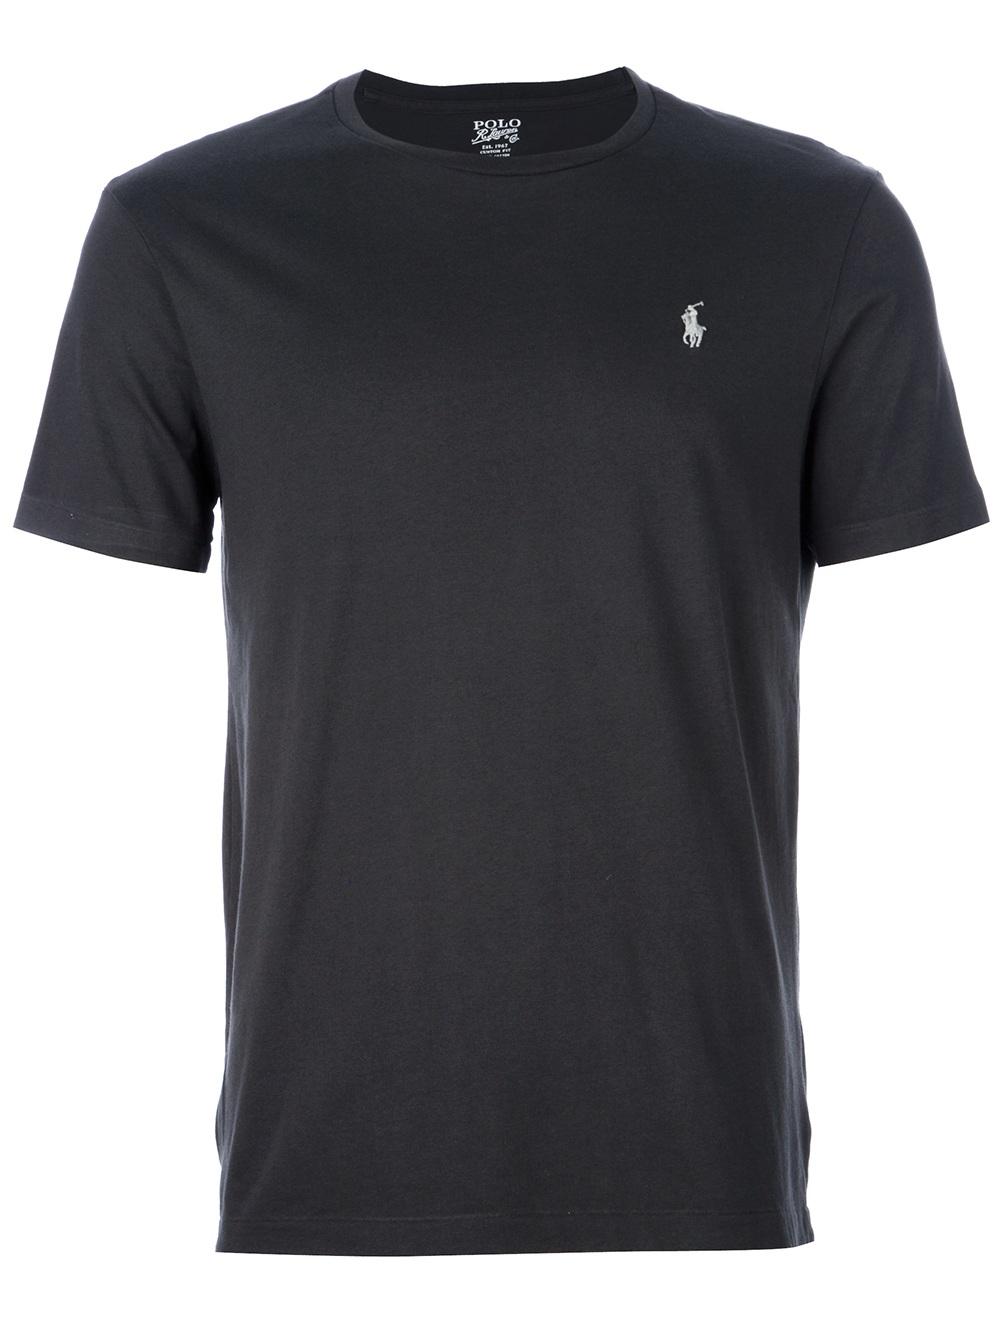 Lyst Polo Ralph Lauren Logo T Shirt In Gray For Men